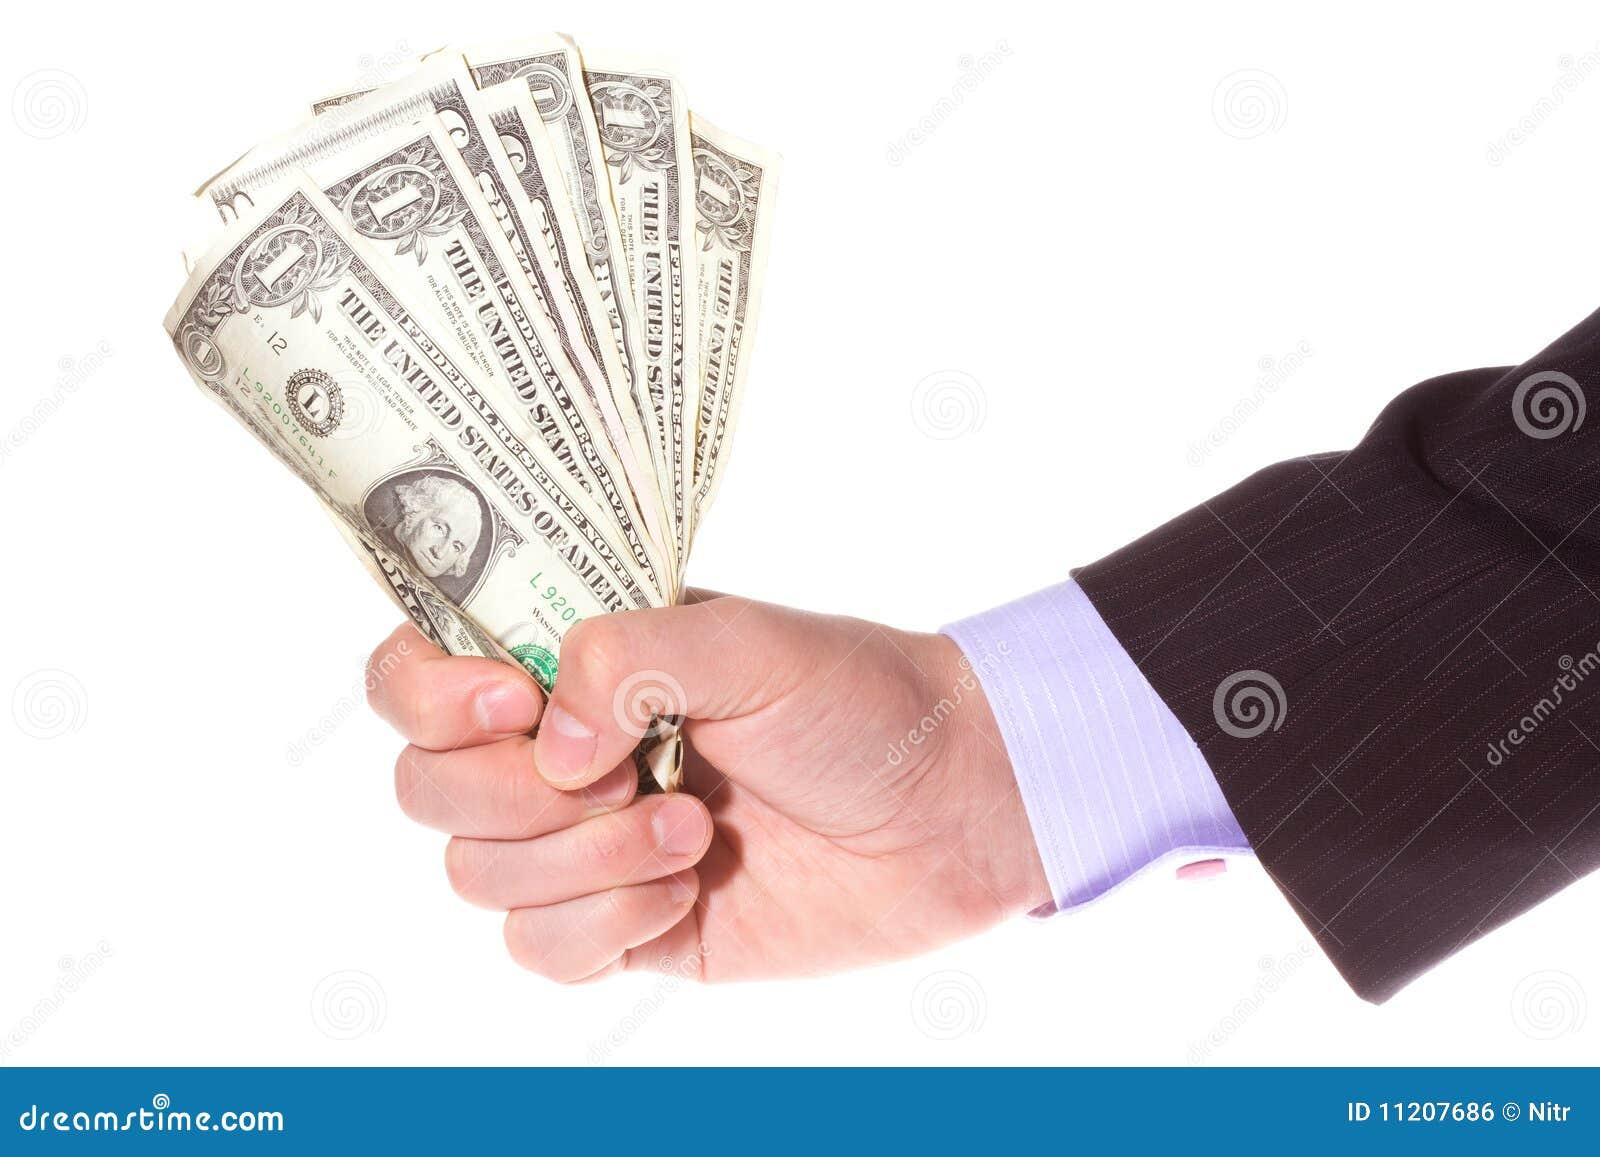 Hand Holding Money Royalty Free Stock Image - Image: 11207686Holding Money In Hand